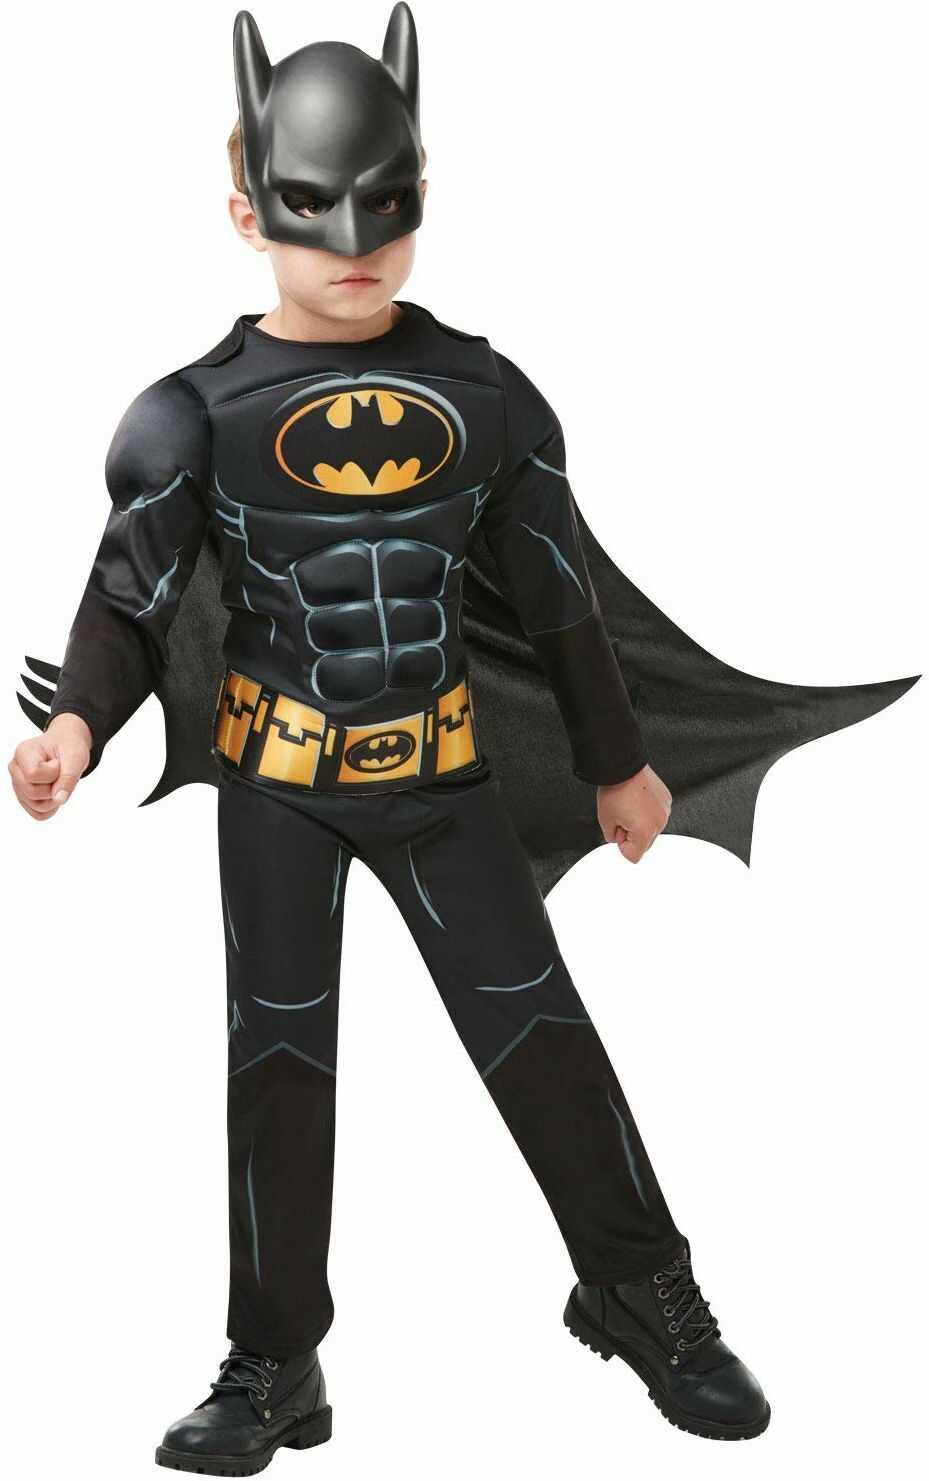 Rubie''s 3300002 Black Core Batman Deluxe  kostium Child czarny, M